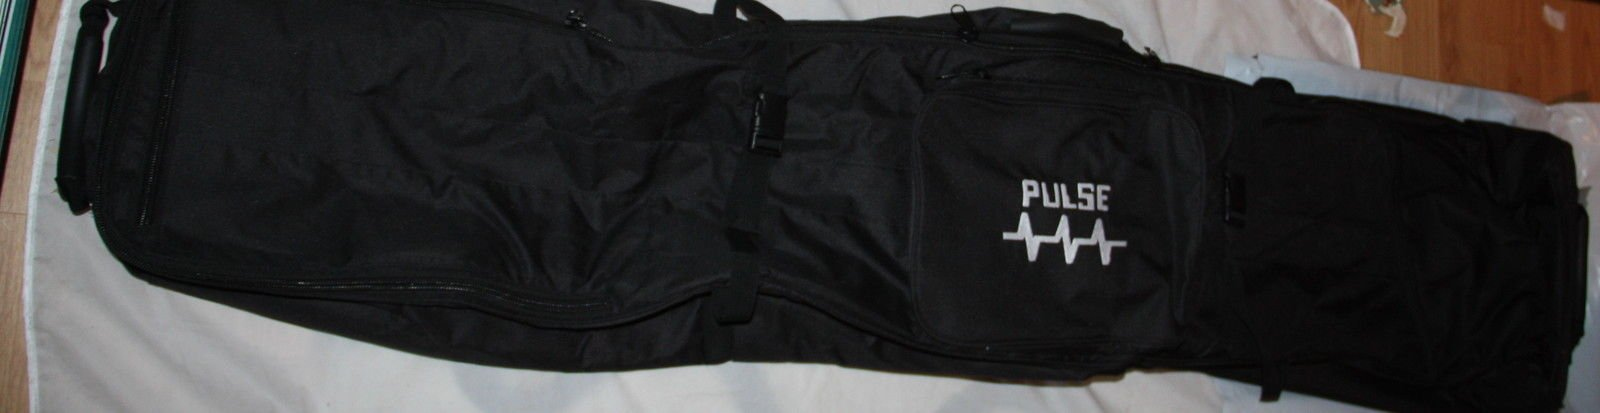 Snowboard bag Wheelie padded Pulse travel bag wheels quality high retail NEW Padded snowboard wheelie bag NEW